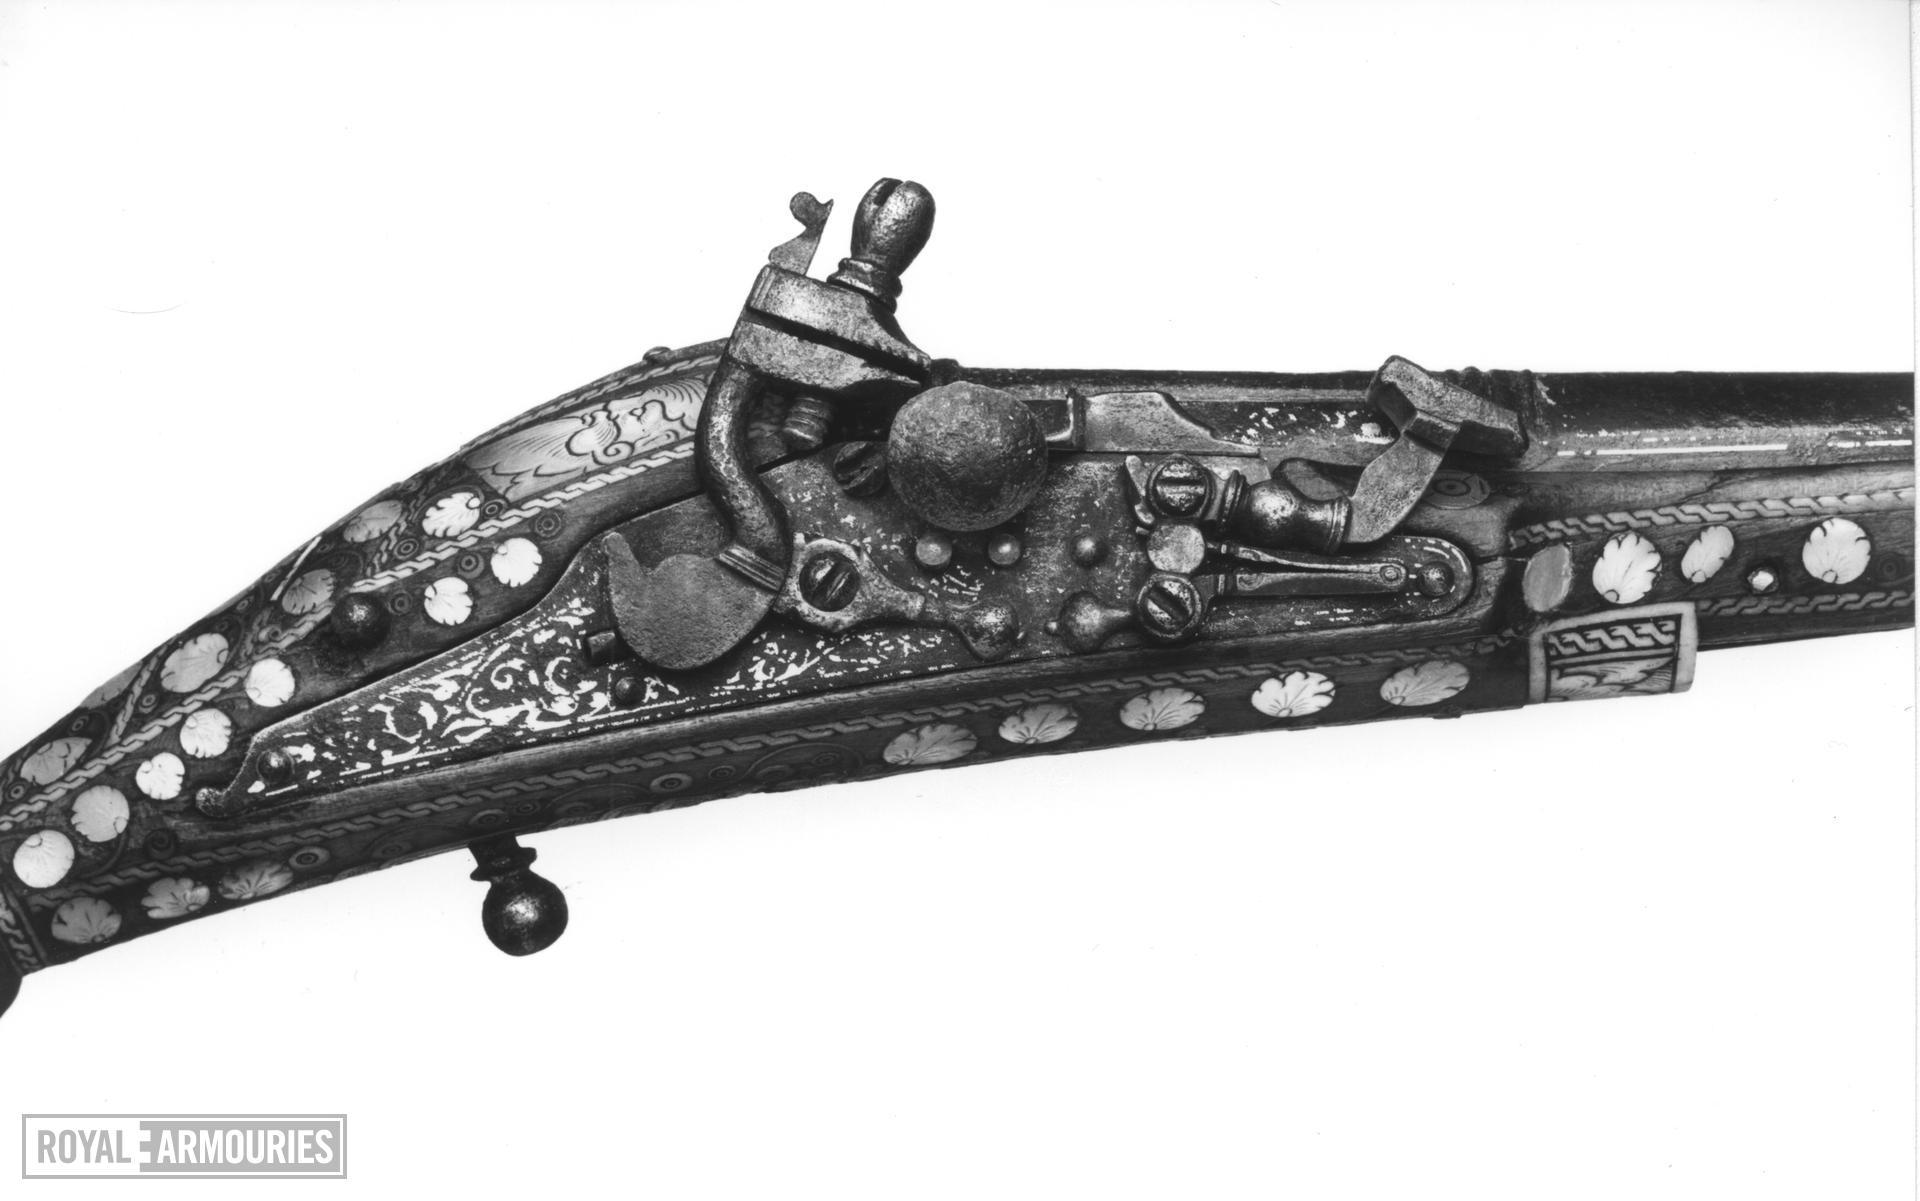 Snaphaunce muzzle-loading pistol - N/A Snaphaunce muzzle-loading pistol, about 1600.